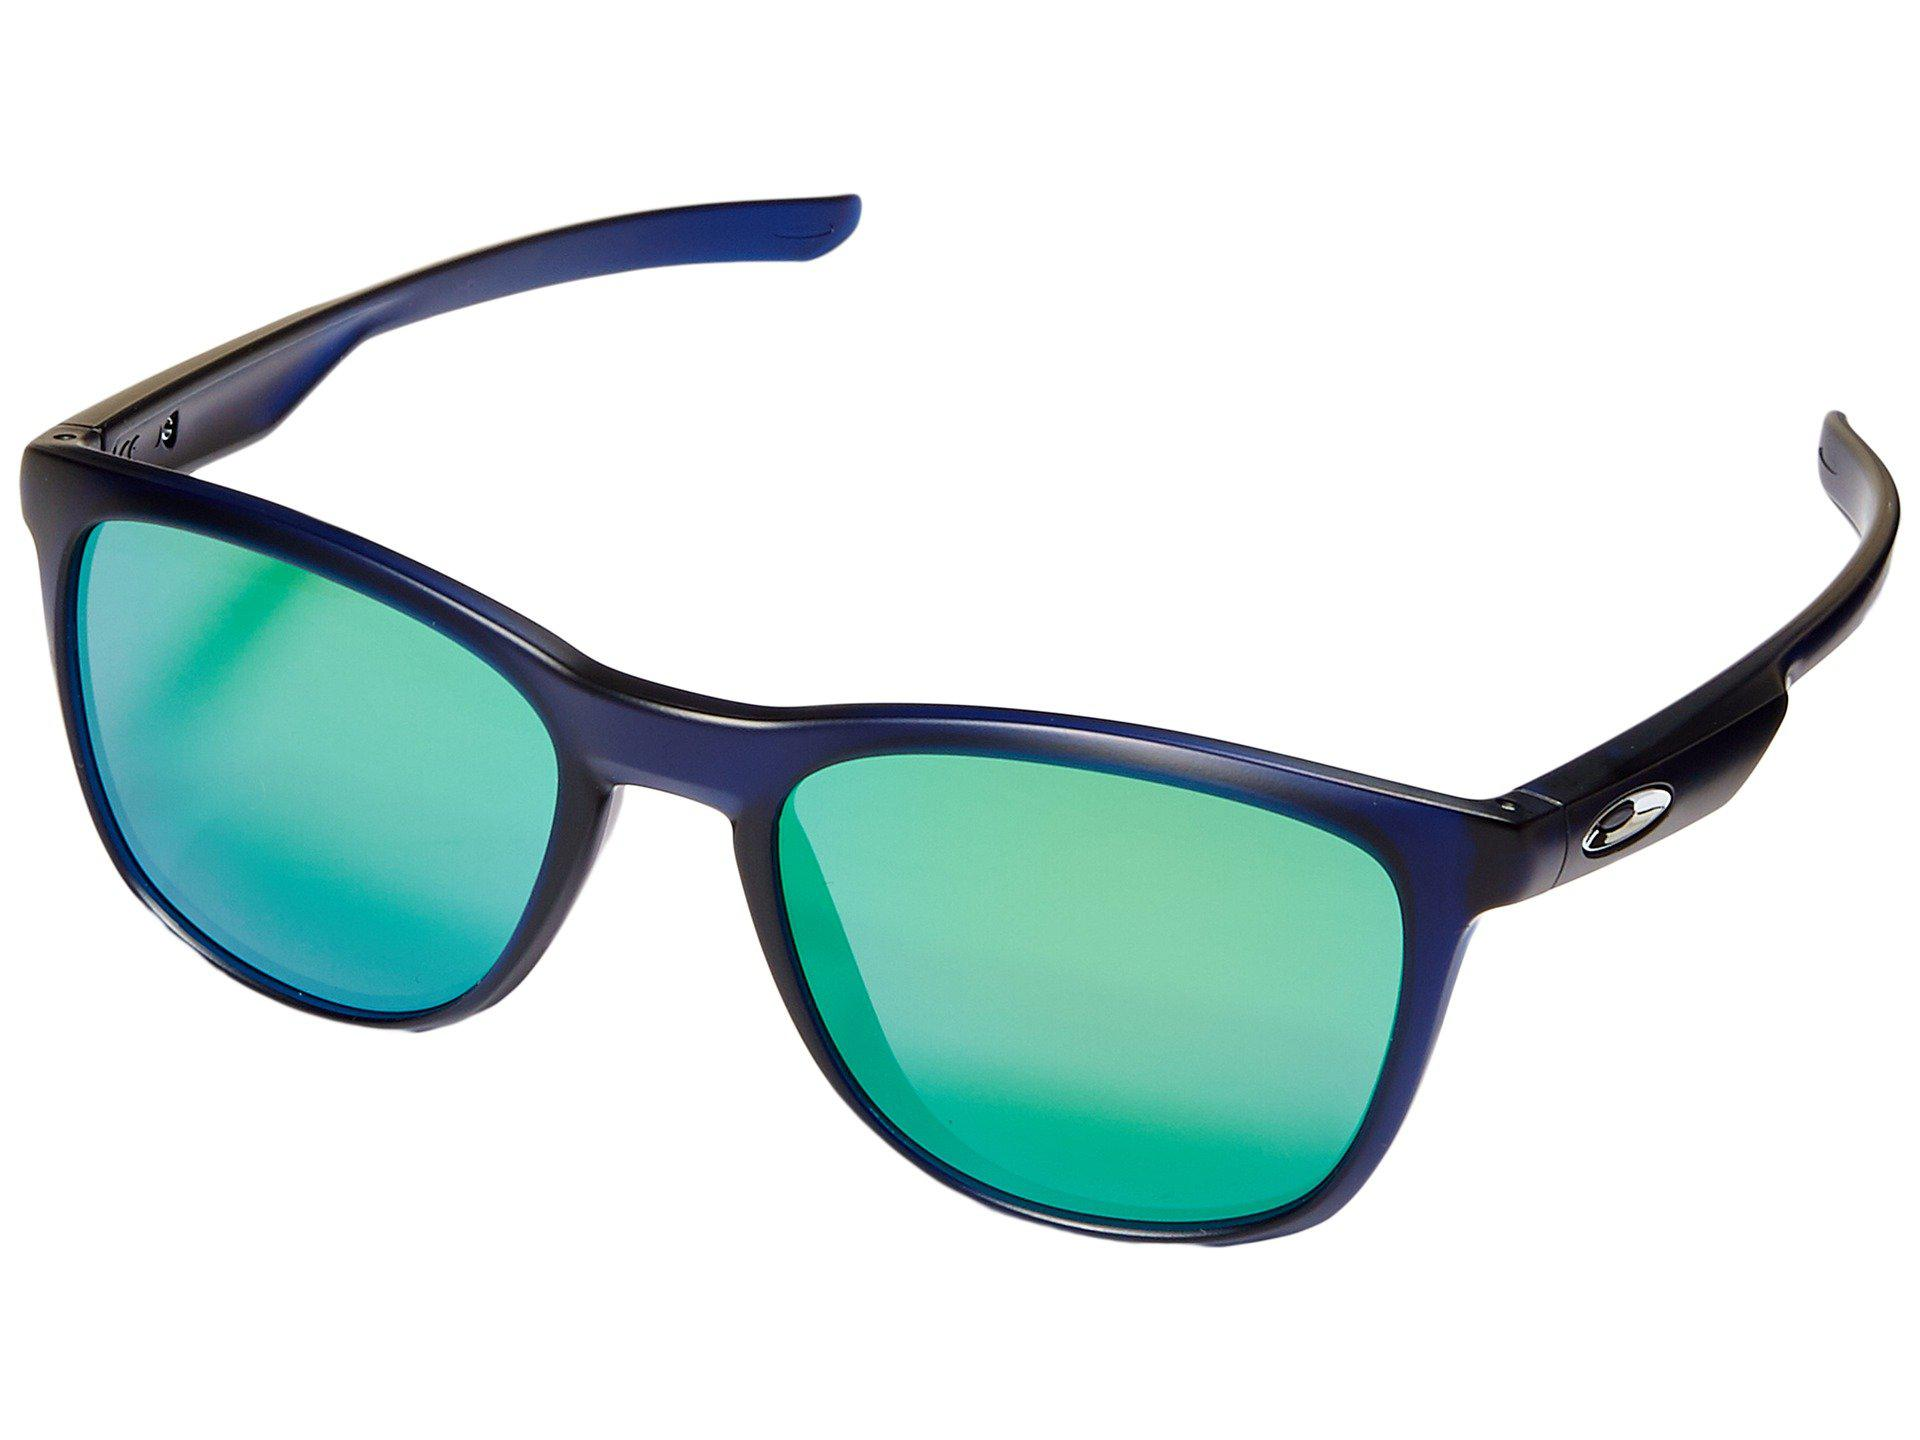 e0a65cc944f Oakley. Women s Blue Trillbe X (matte Black Ink violet Iridium Polarized)  Fashion Sunglasses